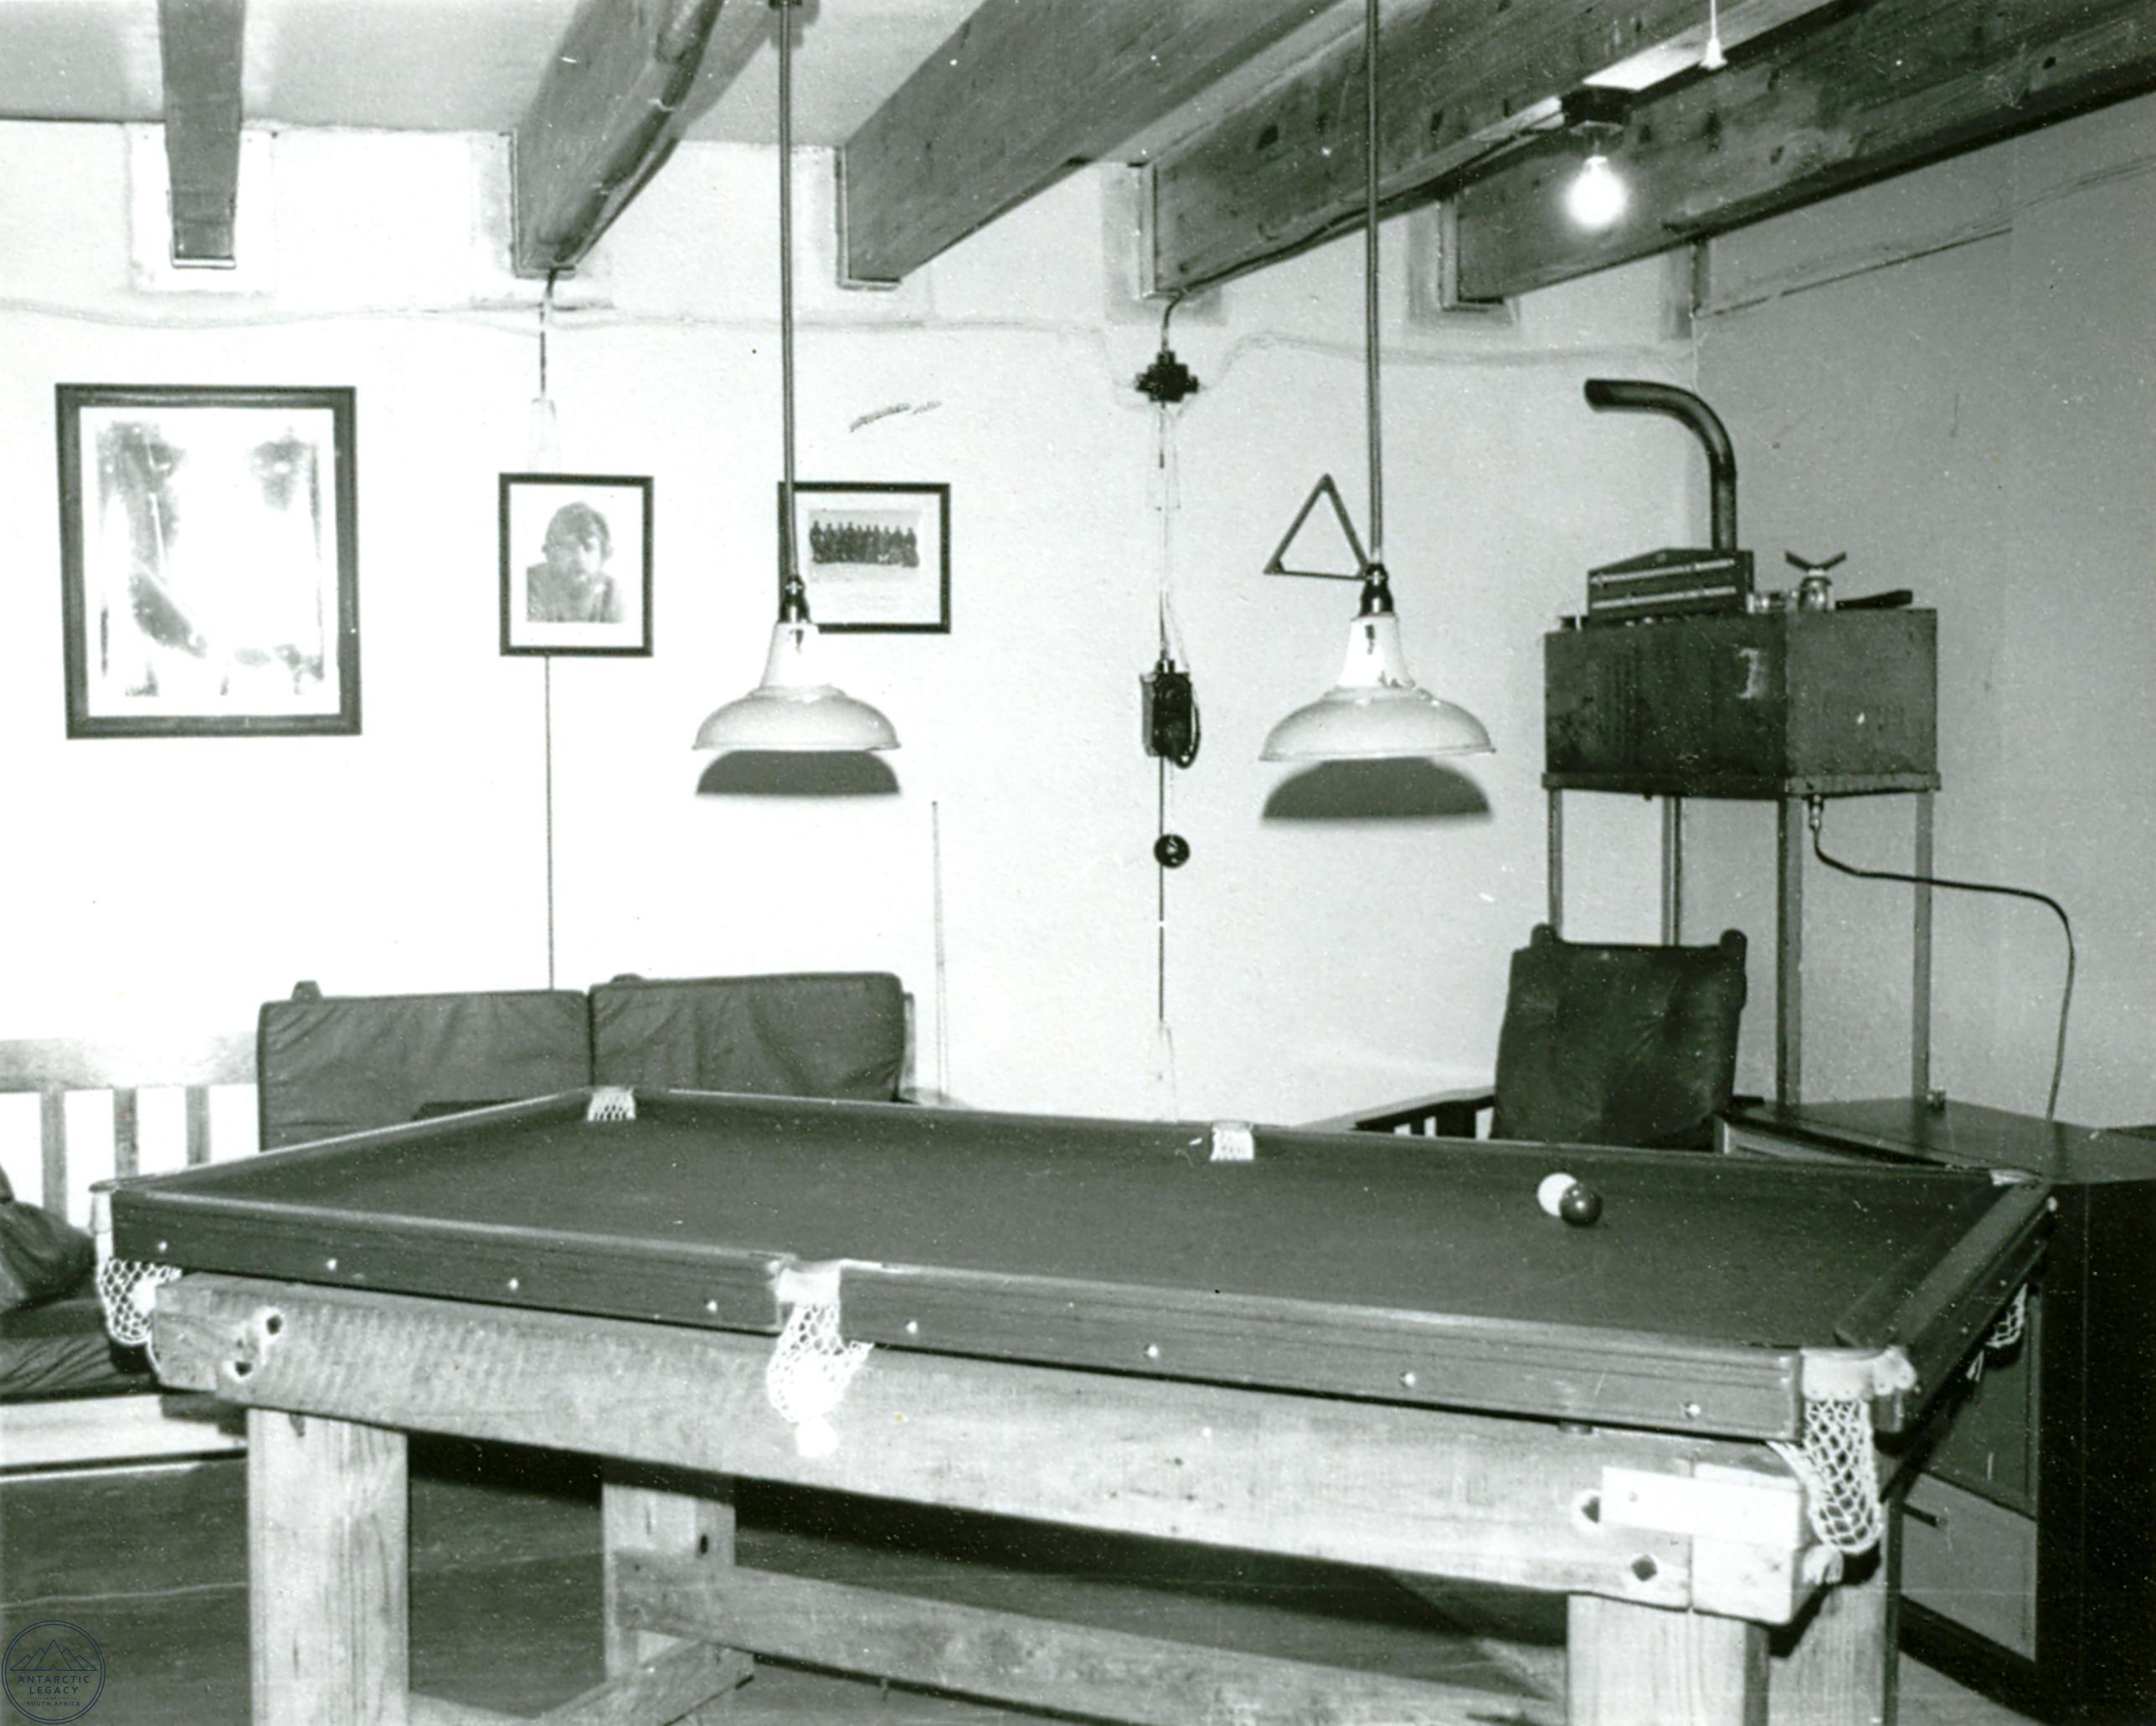 The living room inside SANAE II base